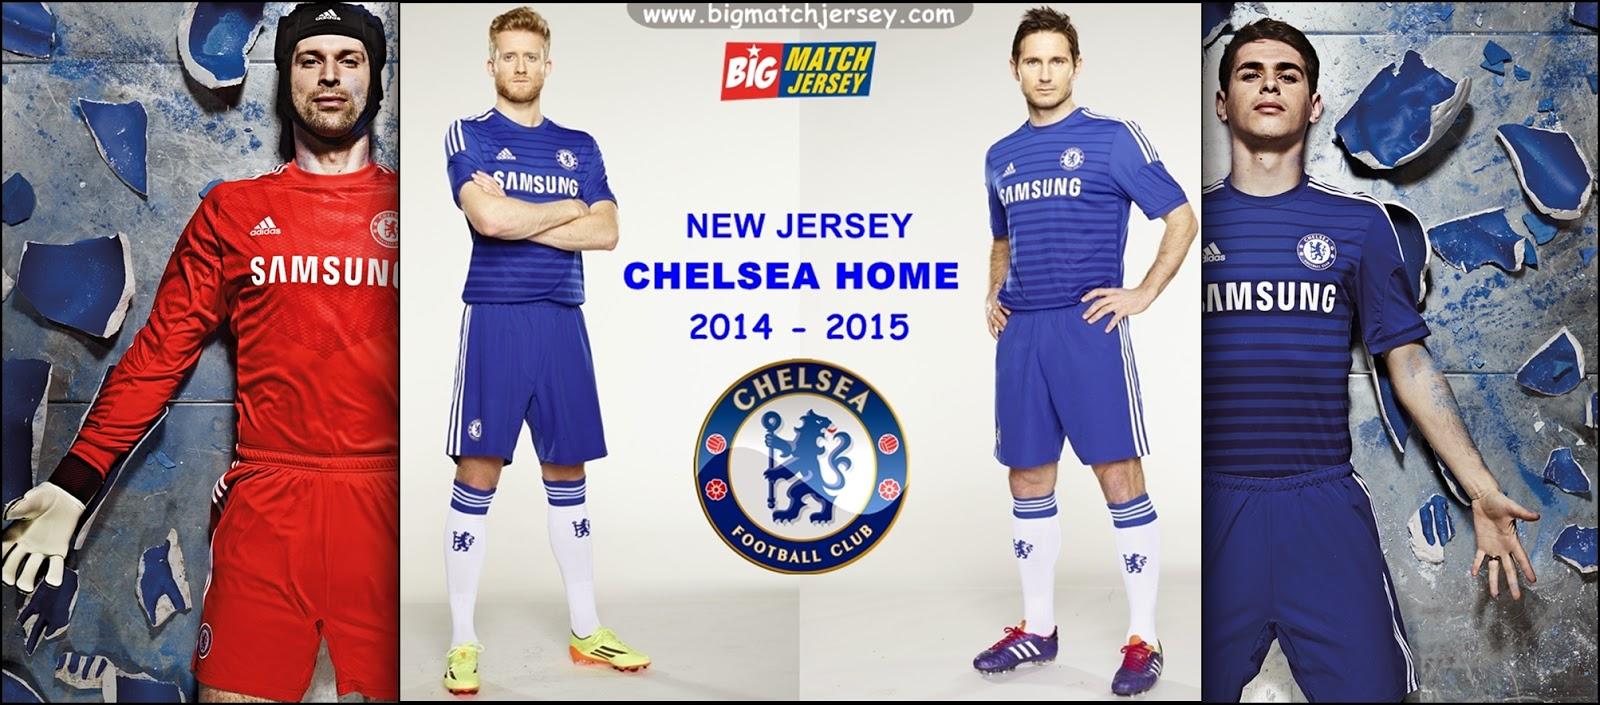 Walpapper Chelsea 2014 - 2015